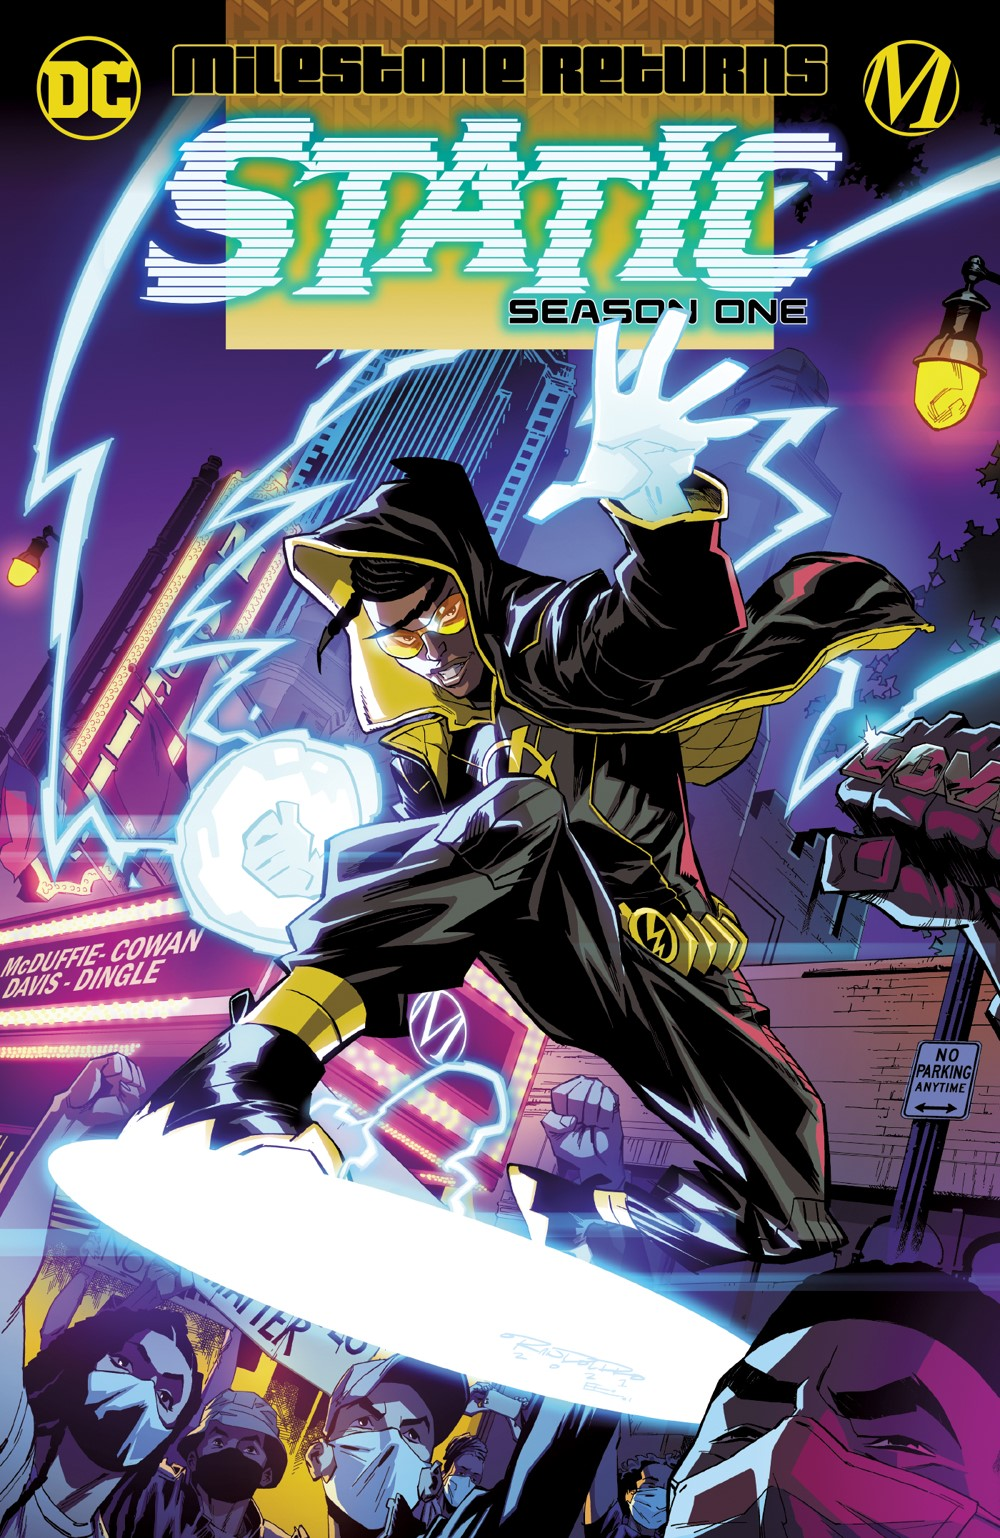 staticseasonone_adv DC Comics December 2021 Solicitations